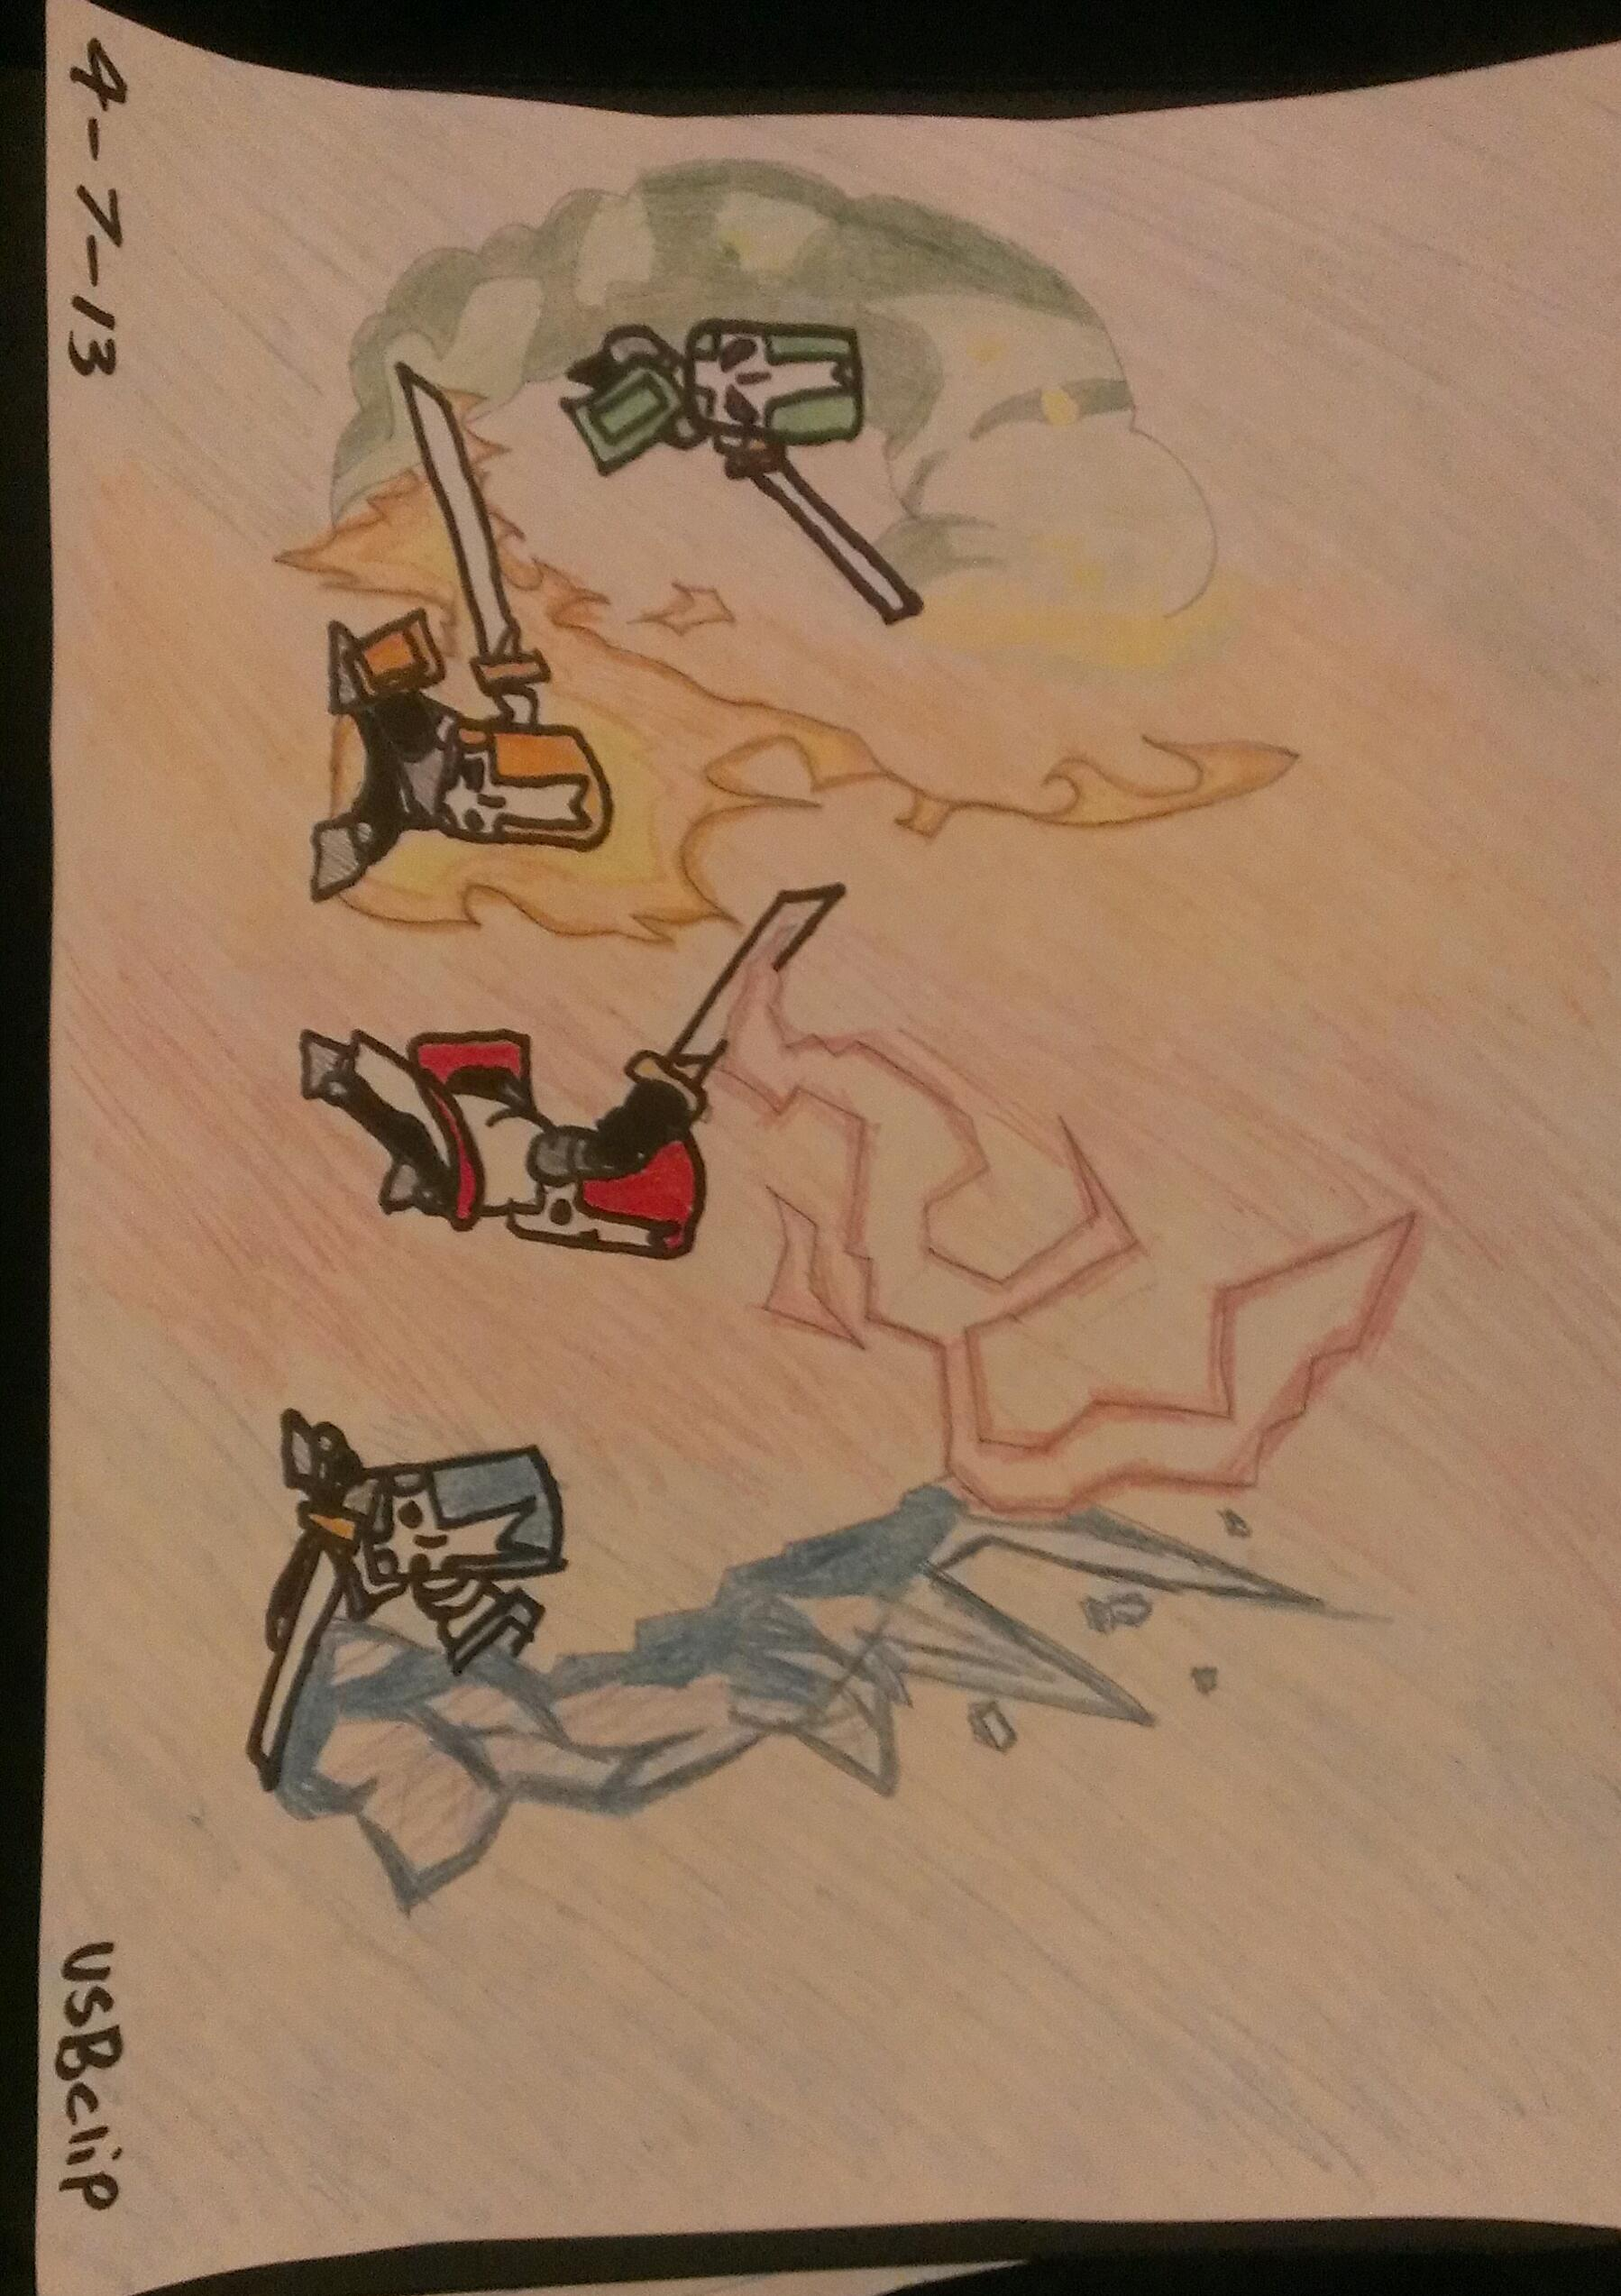 Castle Crashers (Heroic Scene)